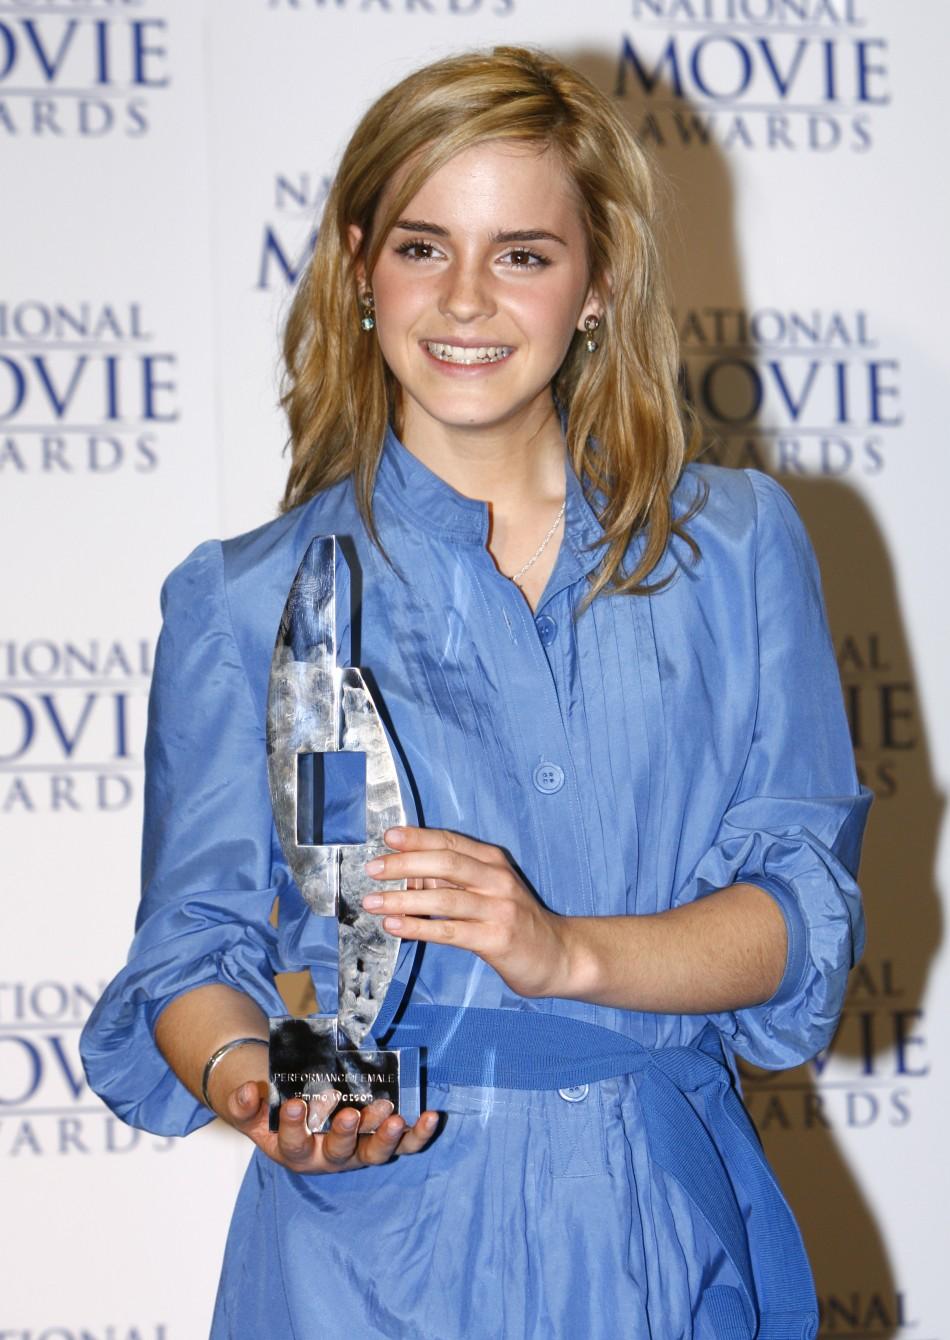 Emma Watson Hairstyles Through the Years